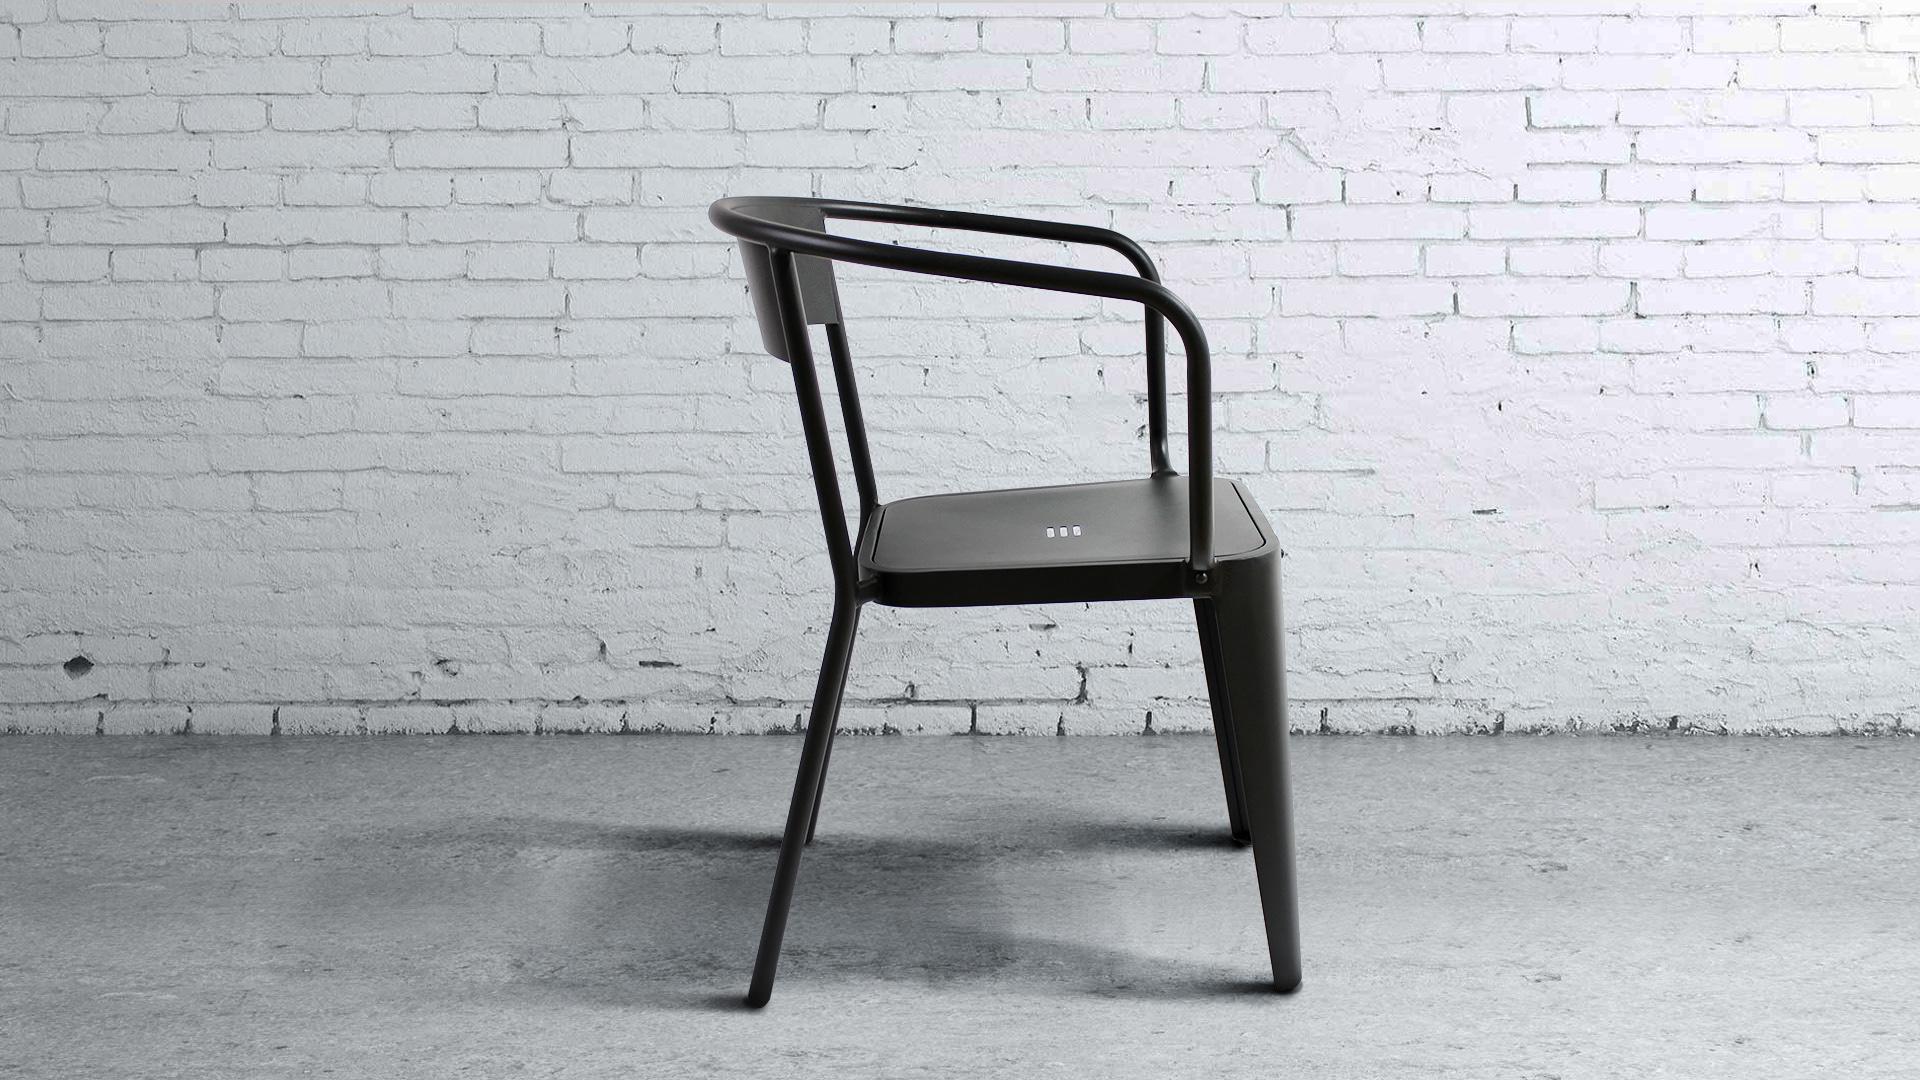 Designbycarrefour le fauteuil industriel - Fauteuil industriel ...